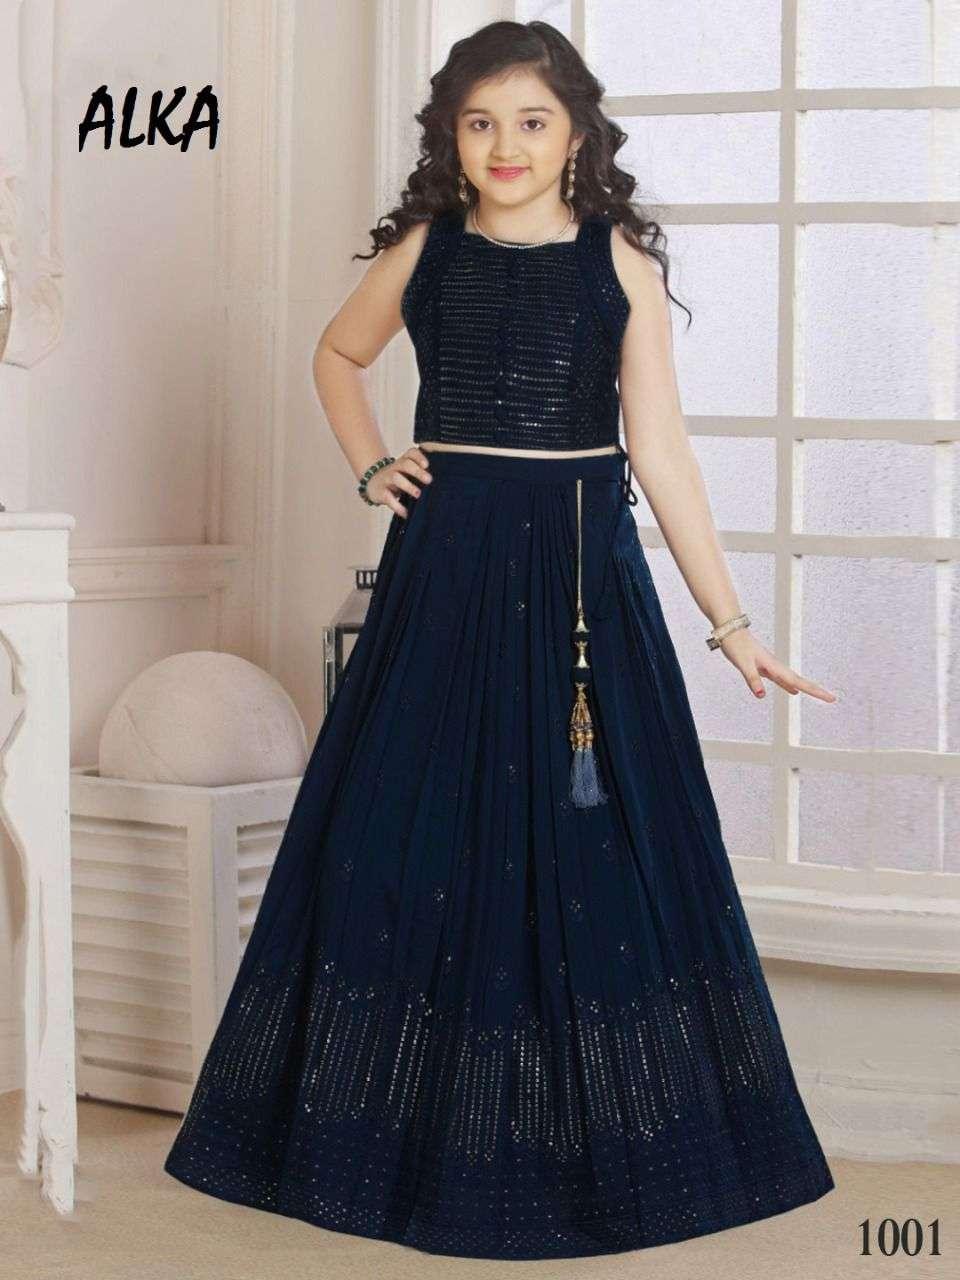 Alka Shaily Exclusive Lids Wear lehenga Choli Catalog Supplier